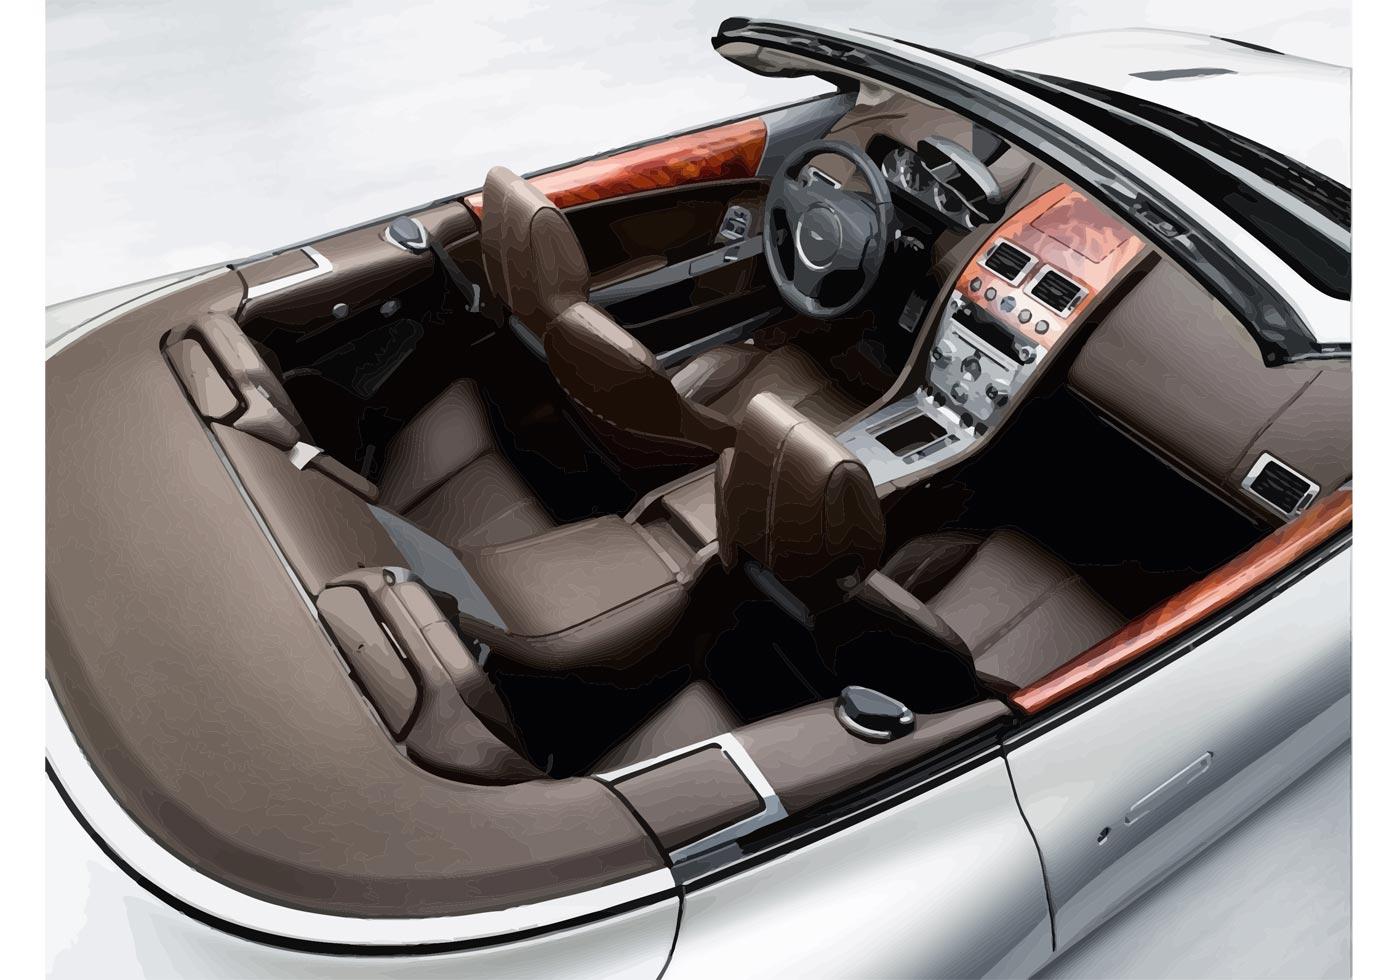 Aston Martin Db9 Interior Download Vetores Gratis Desenhos De Vetor Modelos E Clipart